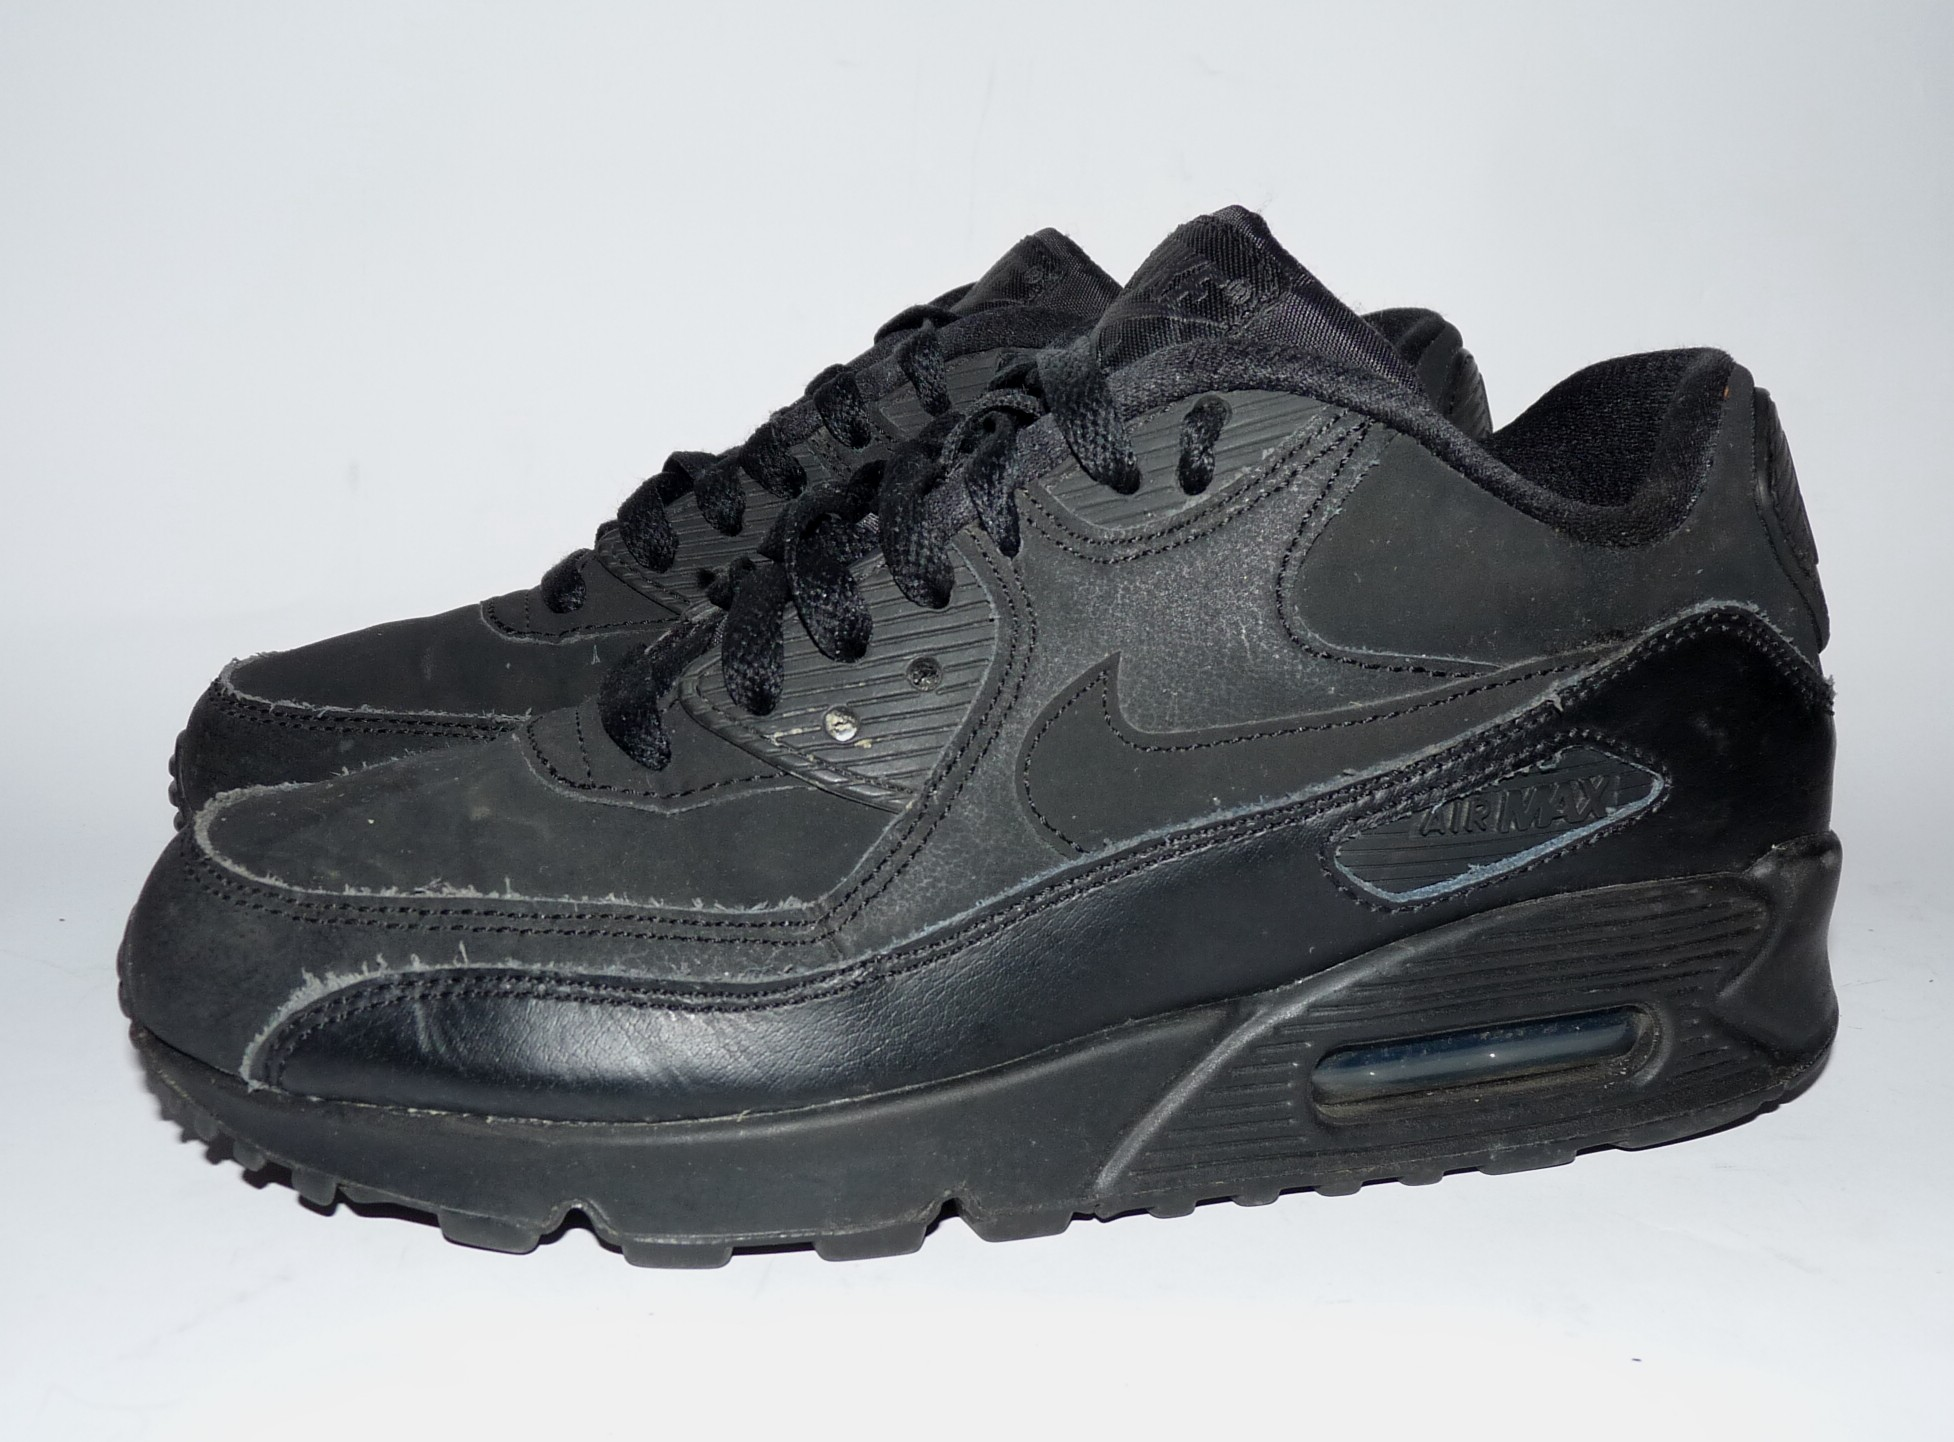 buty damskie nike air max czarne allegro